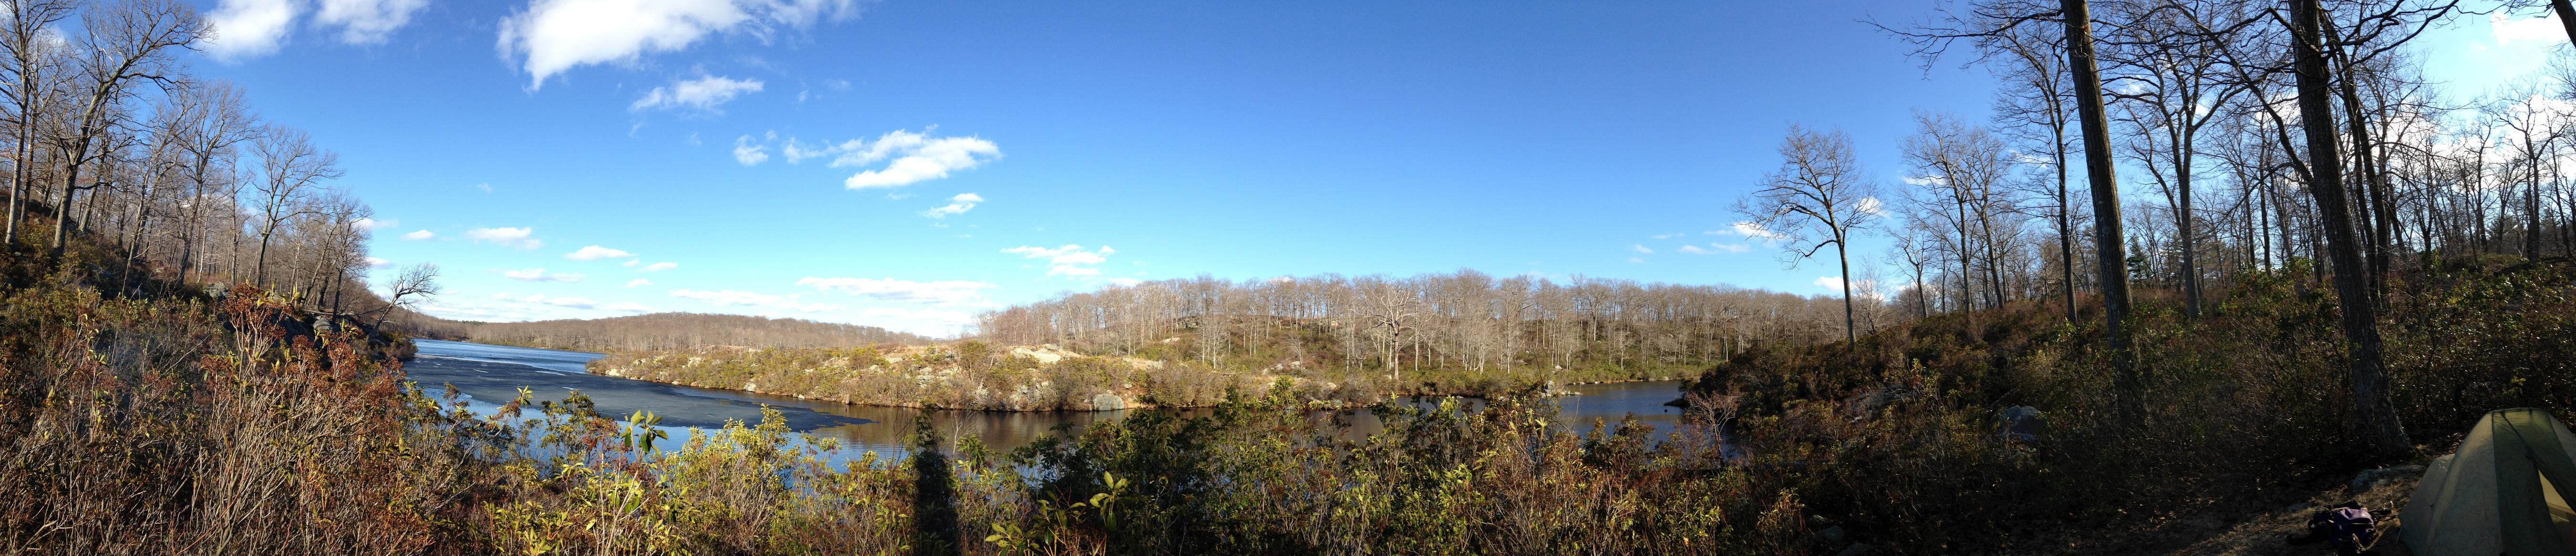 Lake Skenonto and tent panorama